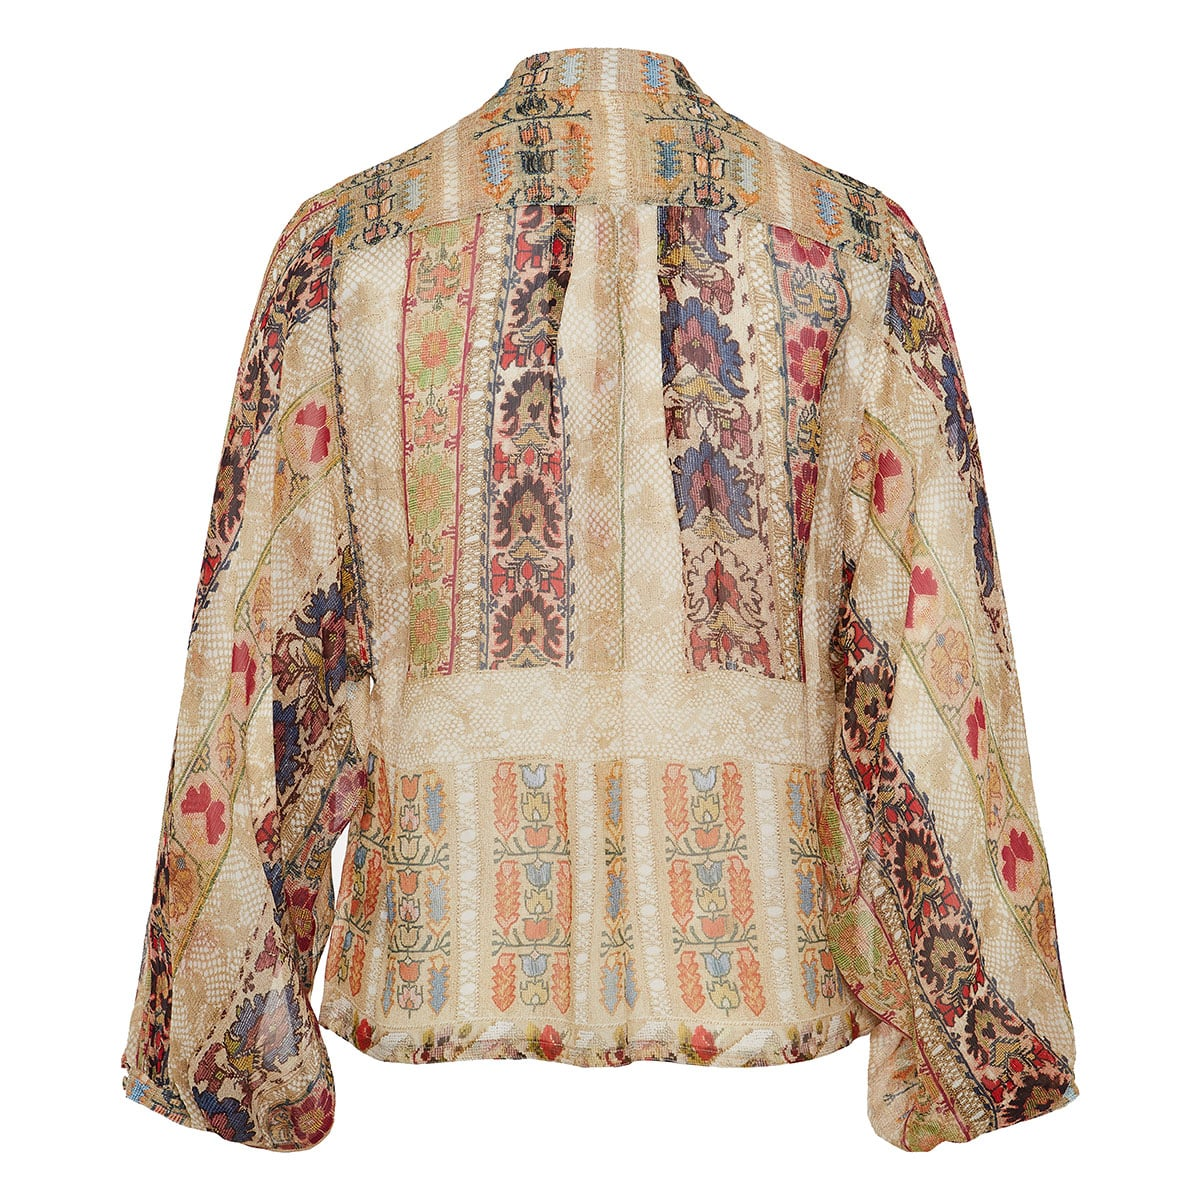 Lace-paneled floral blouse